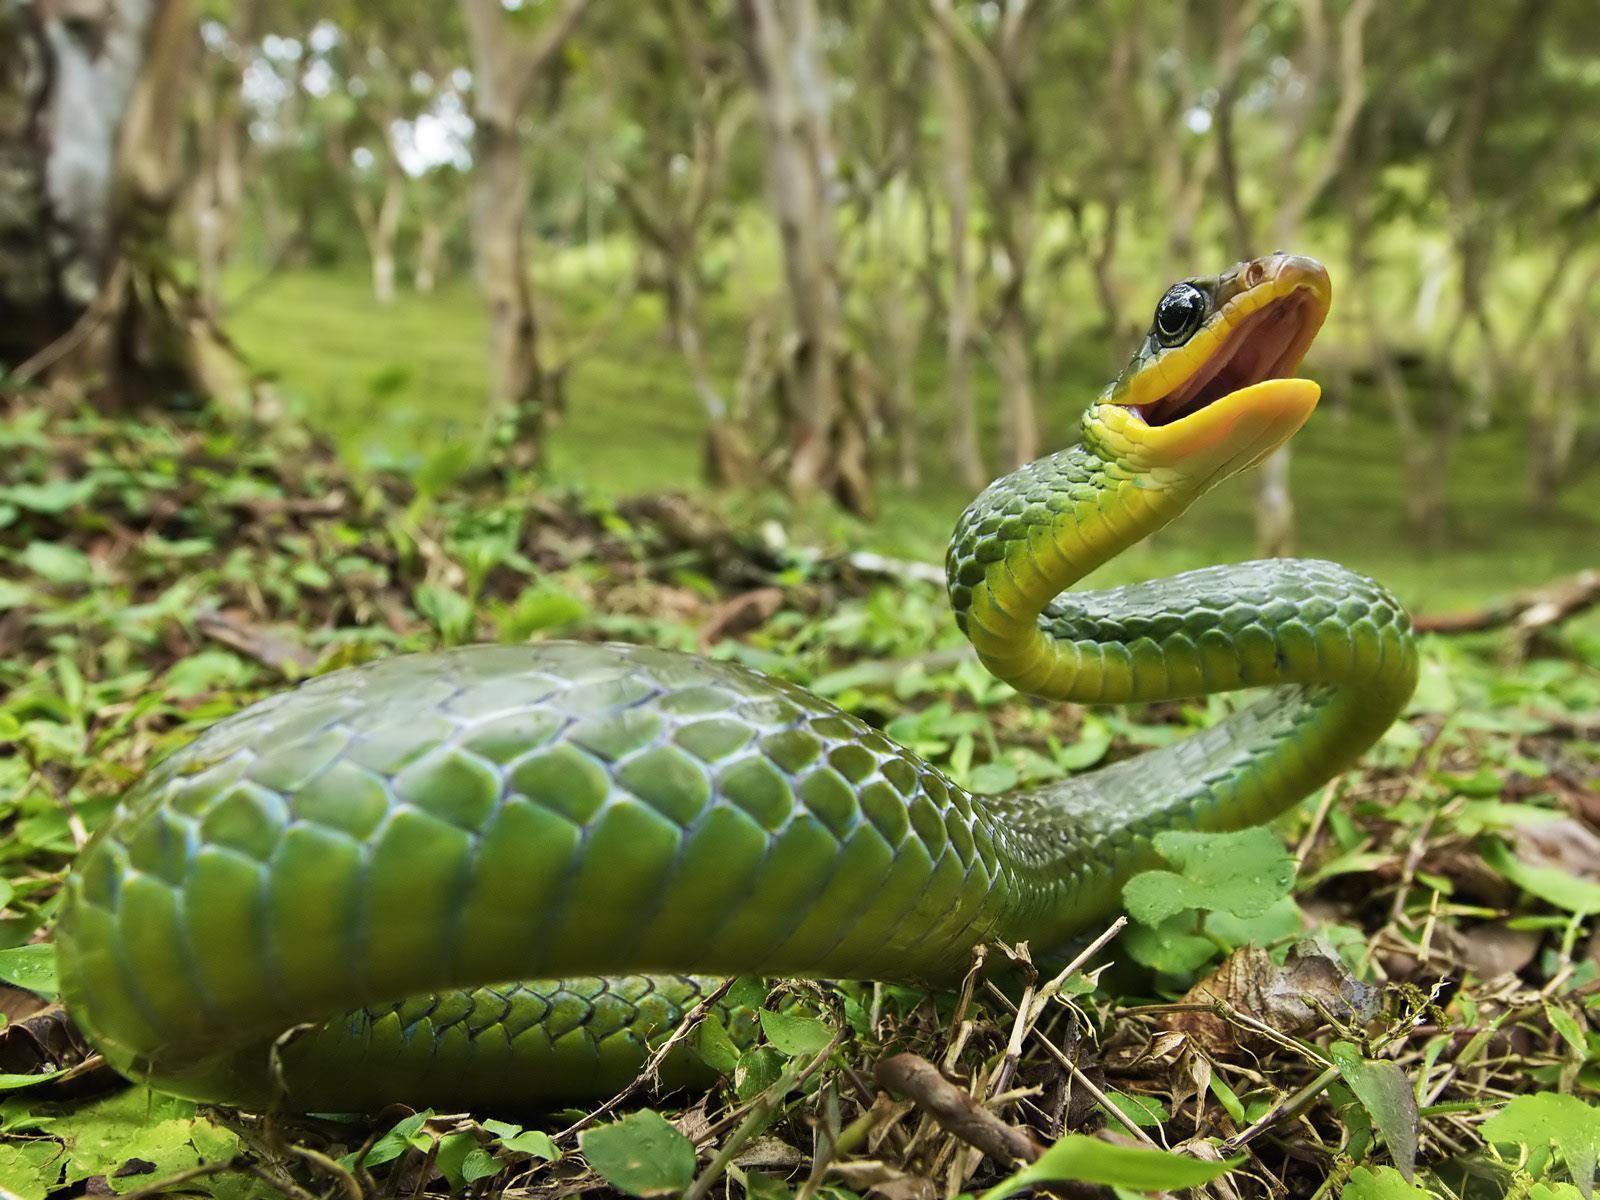 Las serpientes taringa - Green snake hd wallpaper ...